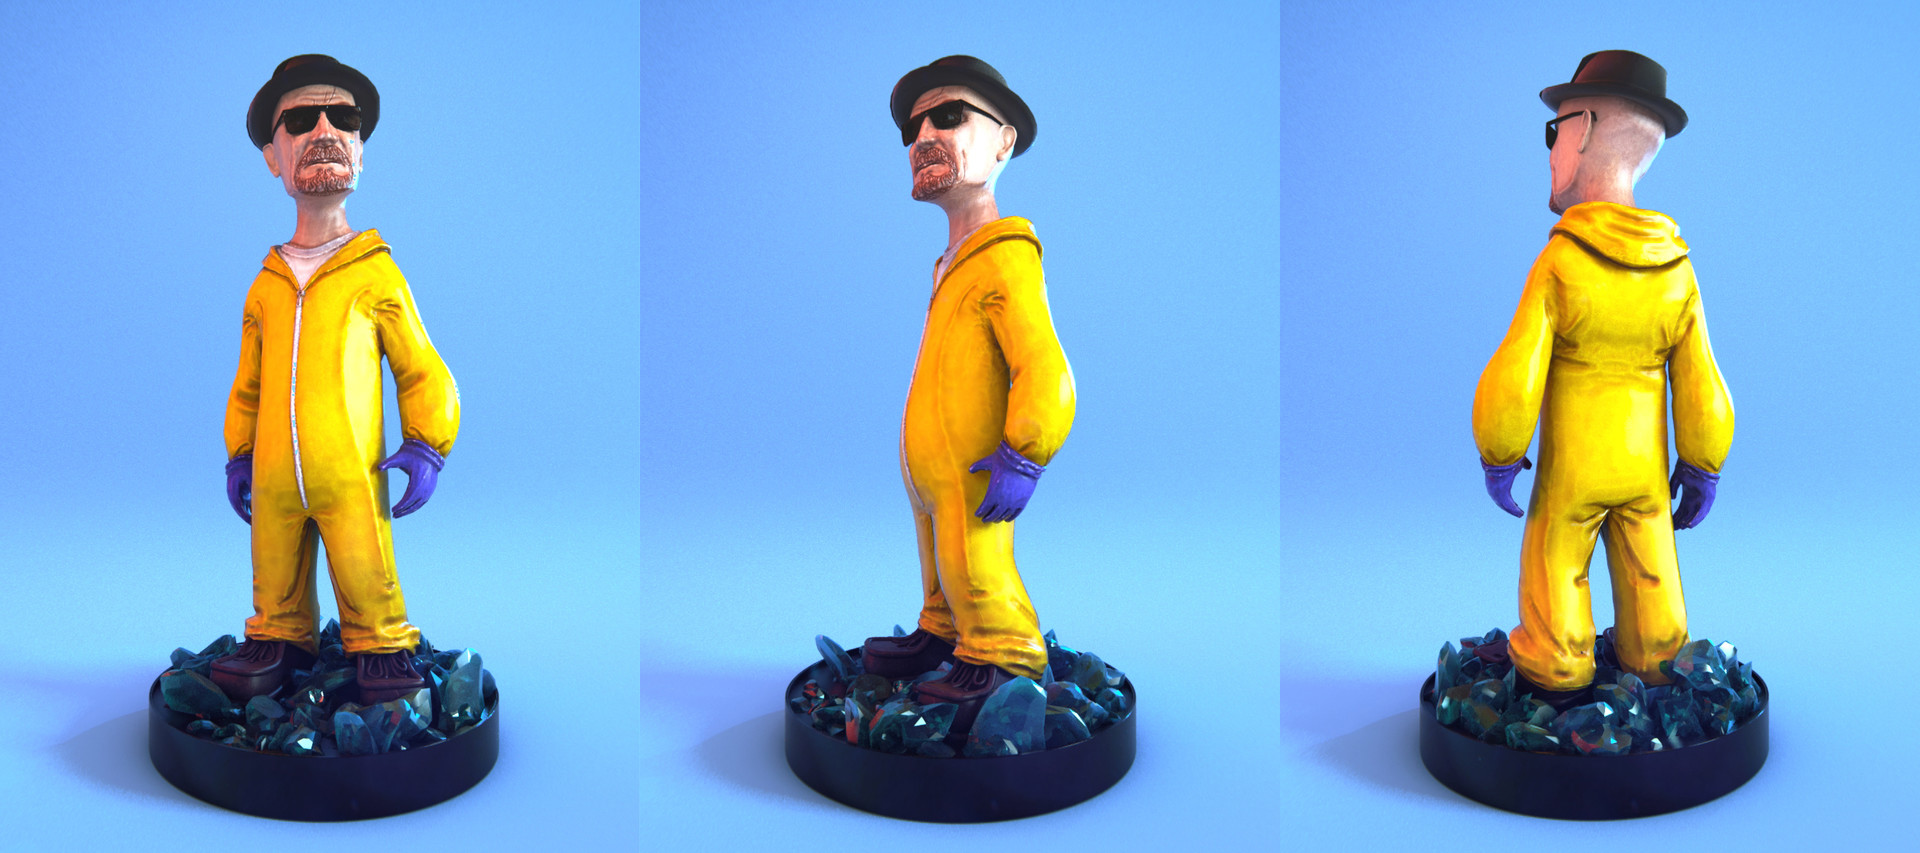 Fabian d abundo walterwhite figurine productrendergesamt